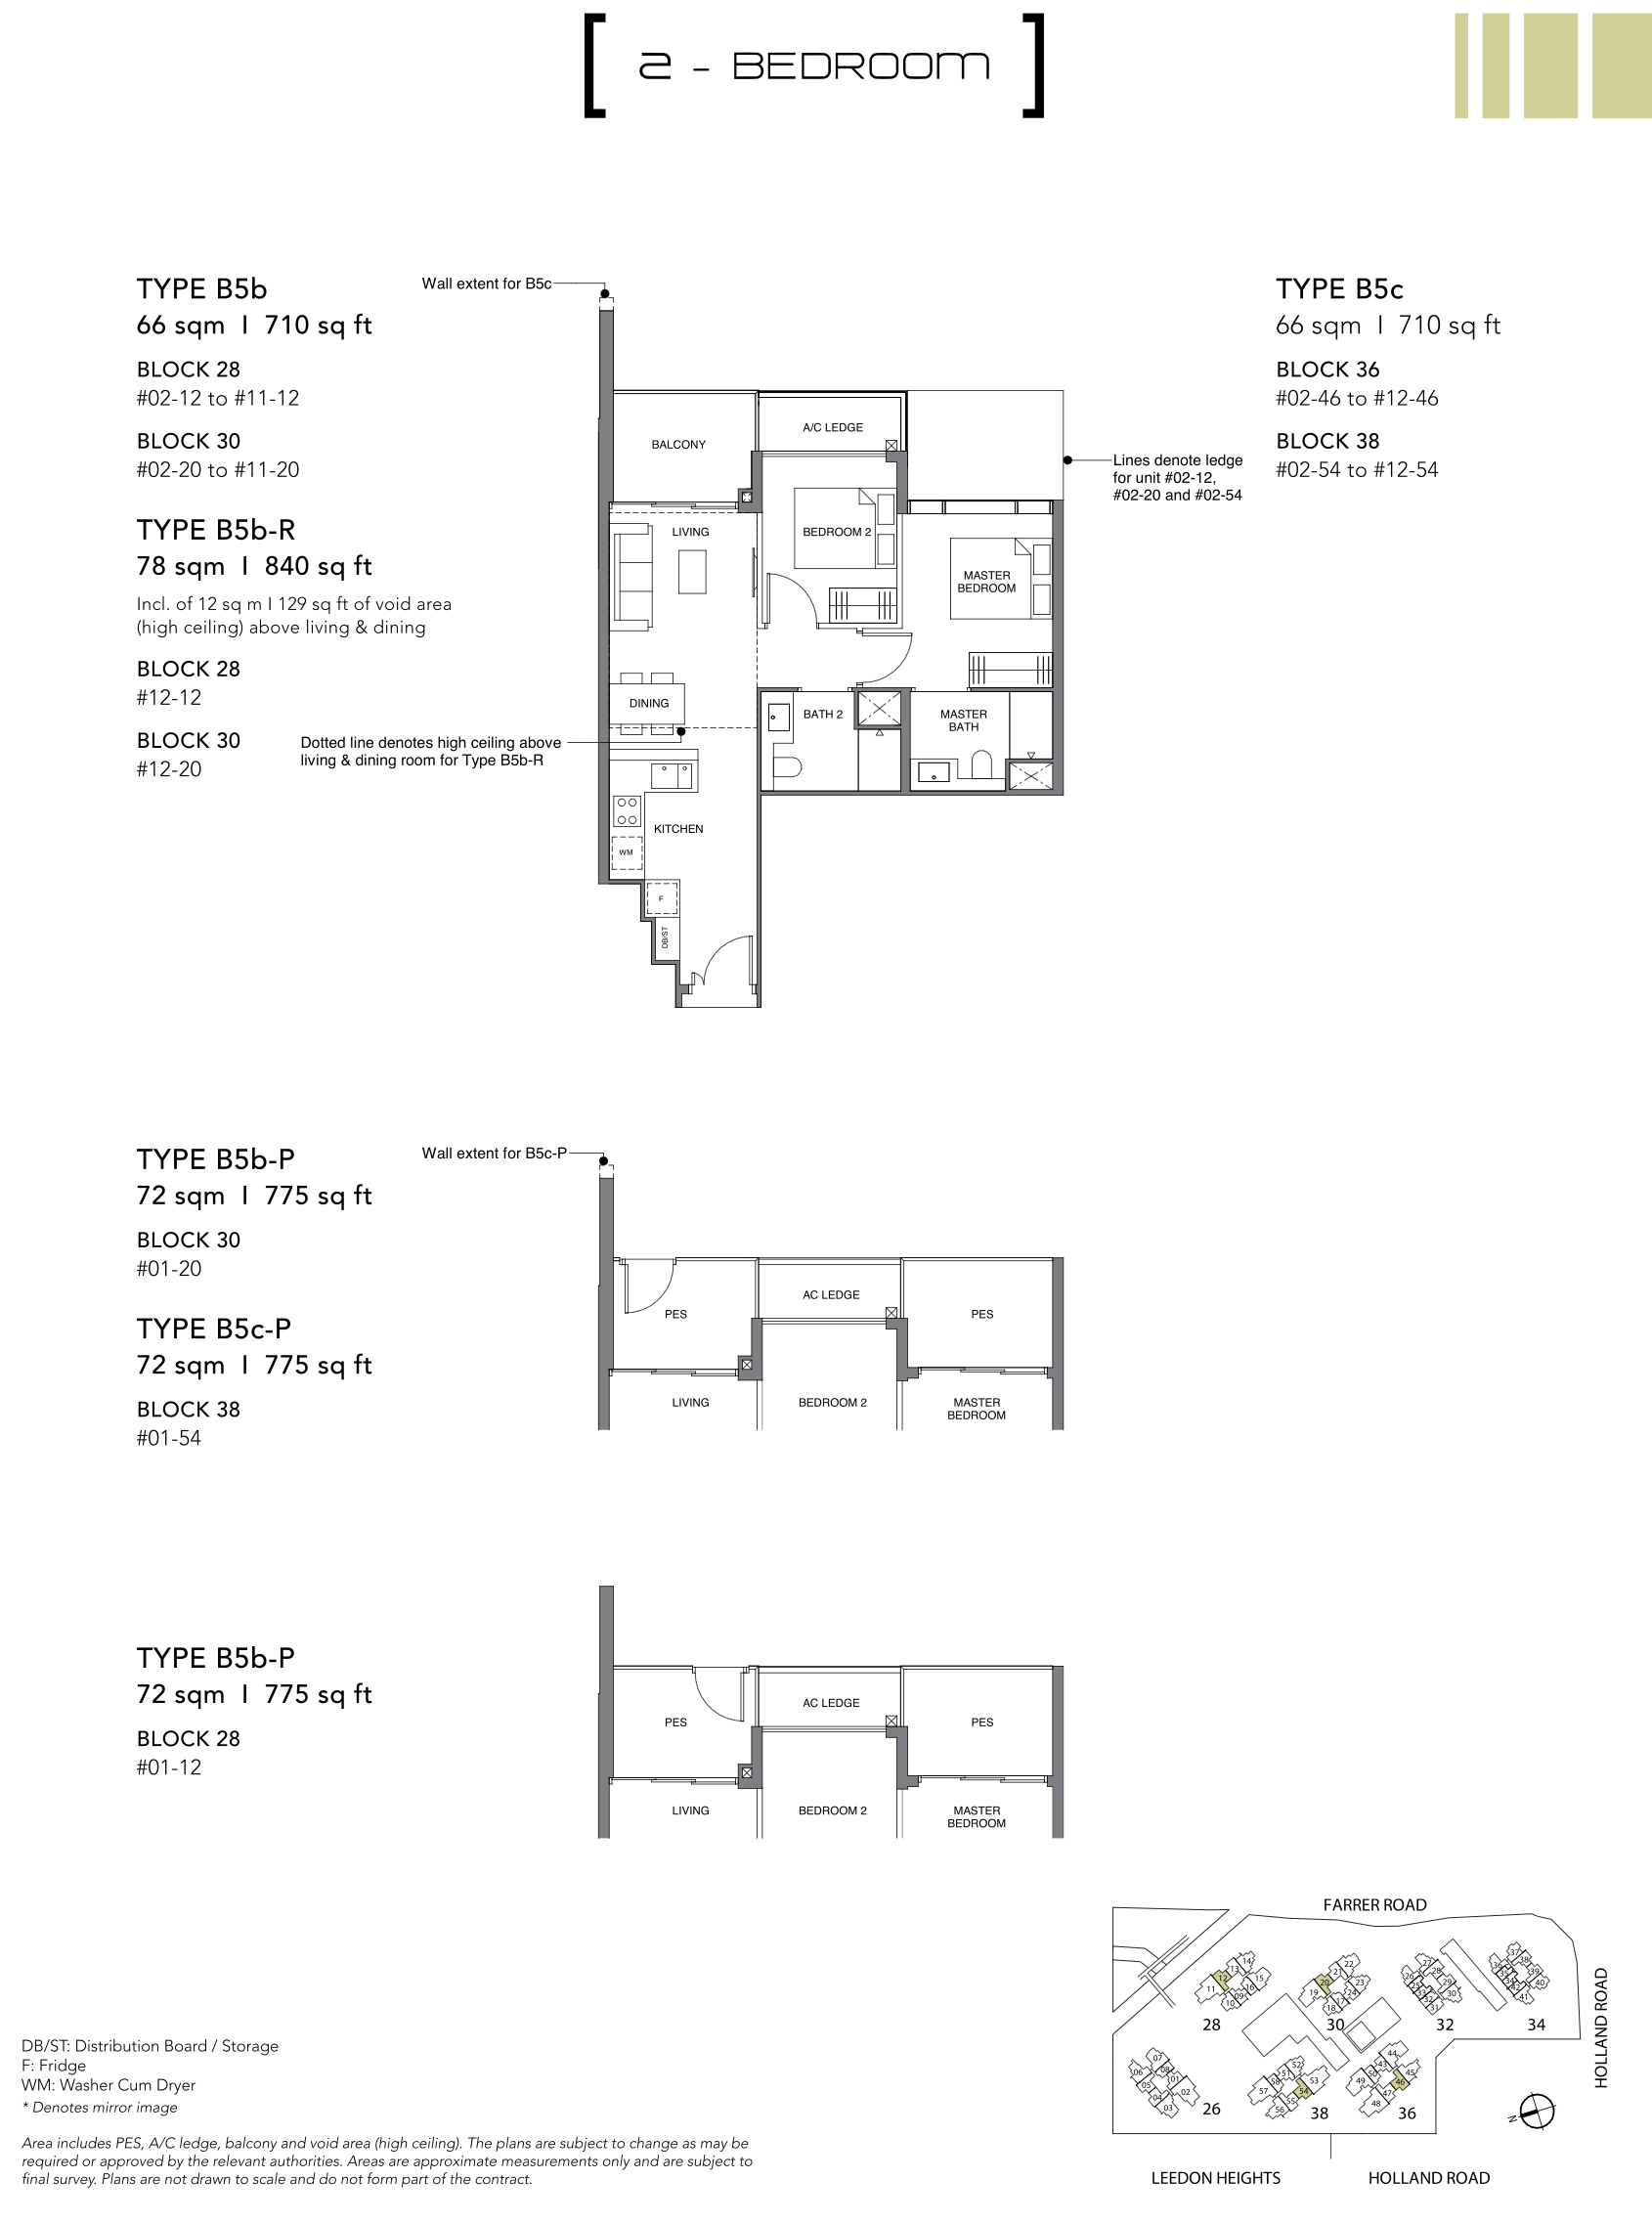 绿墩雅苑公寓户型图 Leedon Green floor plan 2 bedroom b5b-b5c